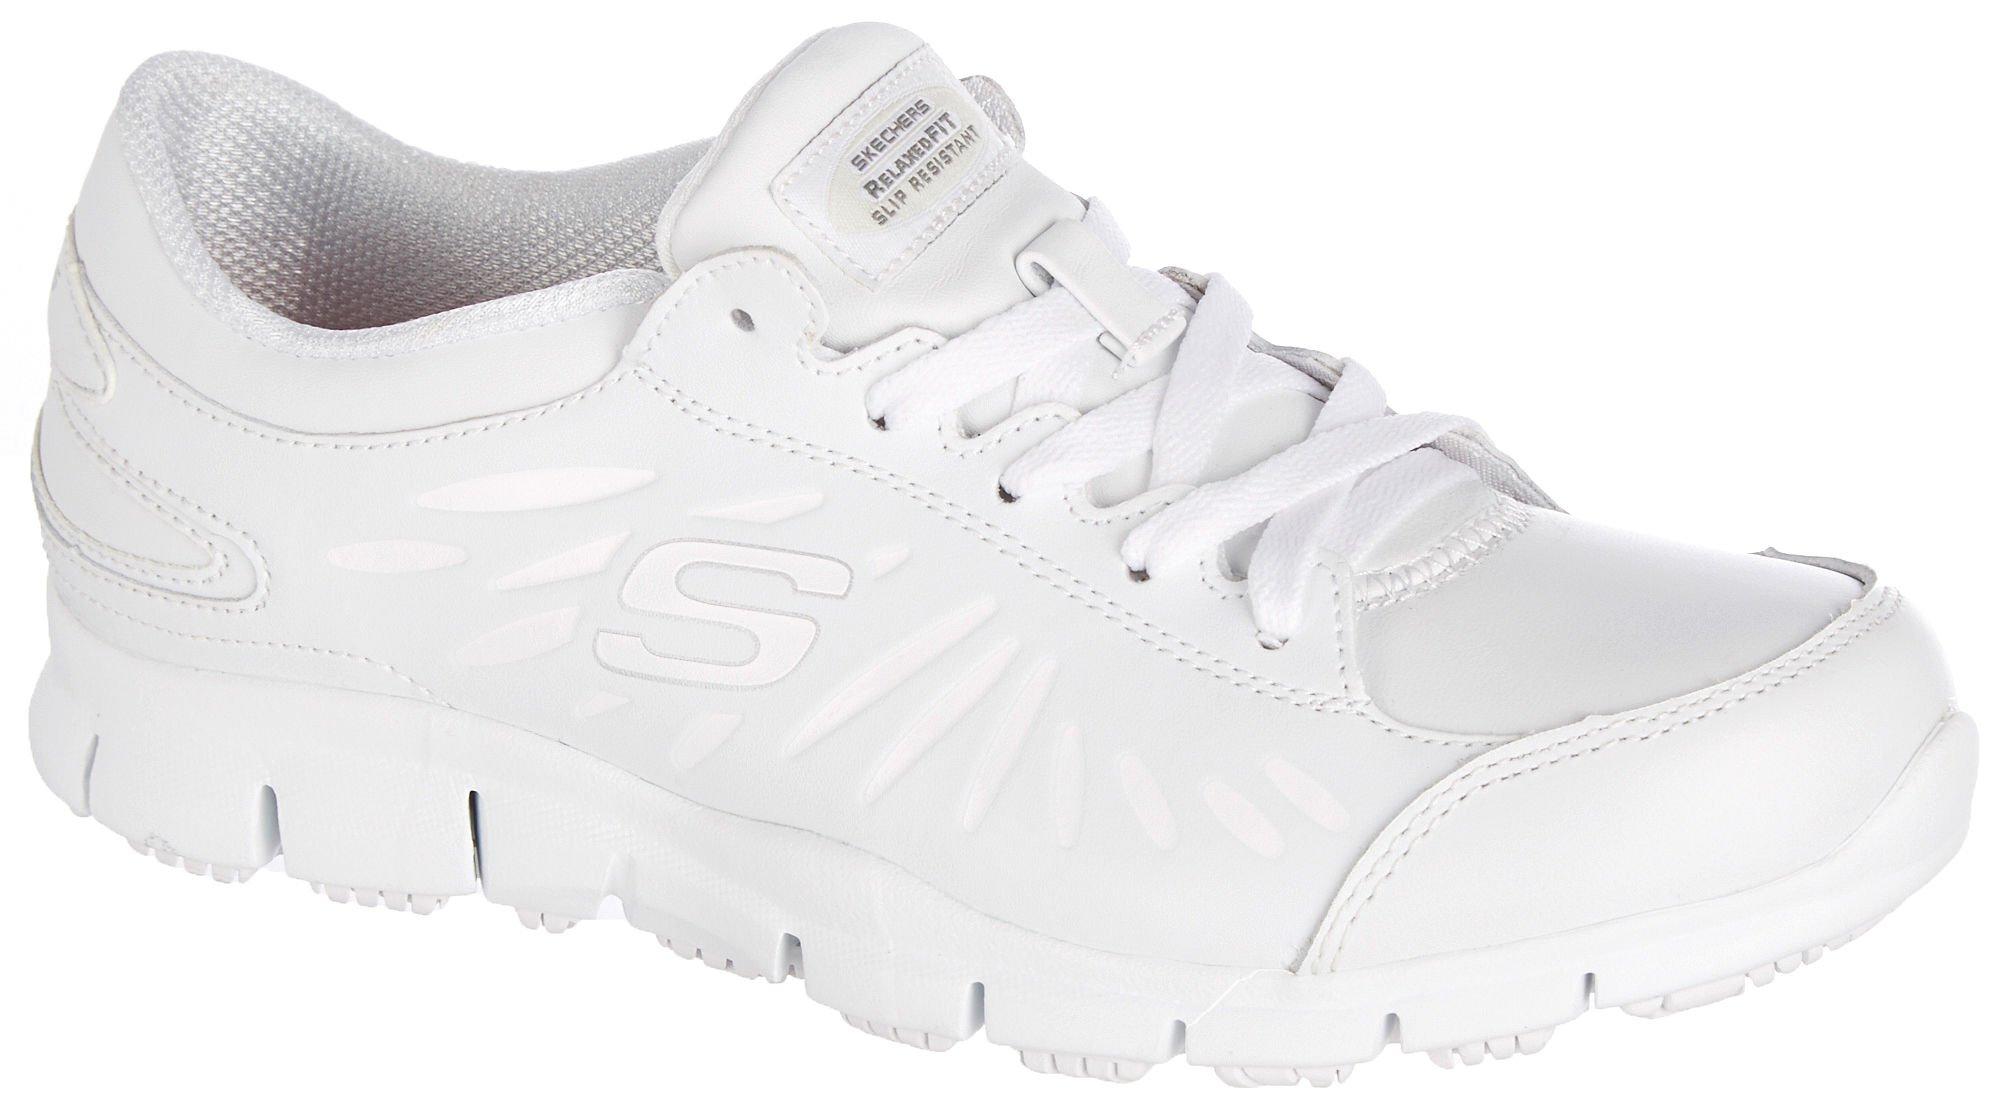 Skechers Women's, Eldred Dewey slip resistant Work Shoes WHITE 11 M